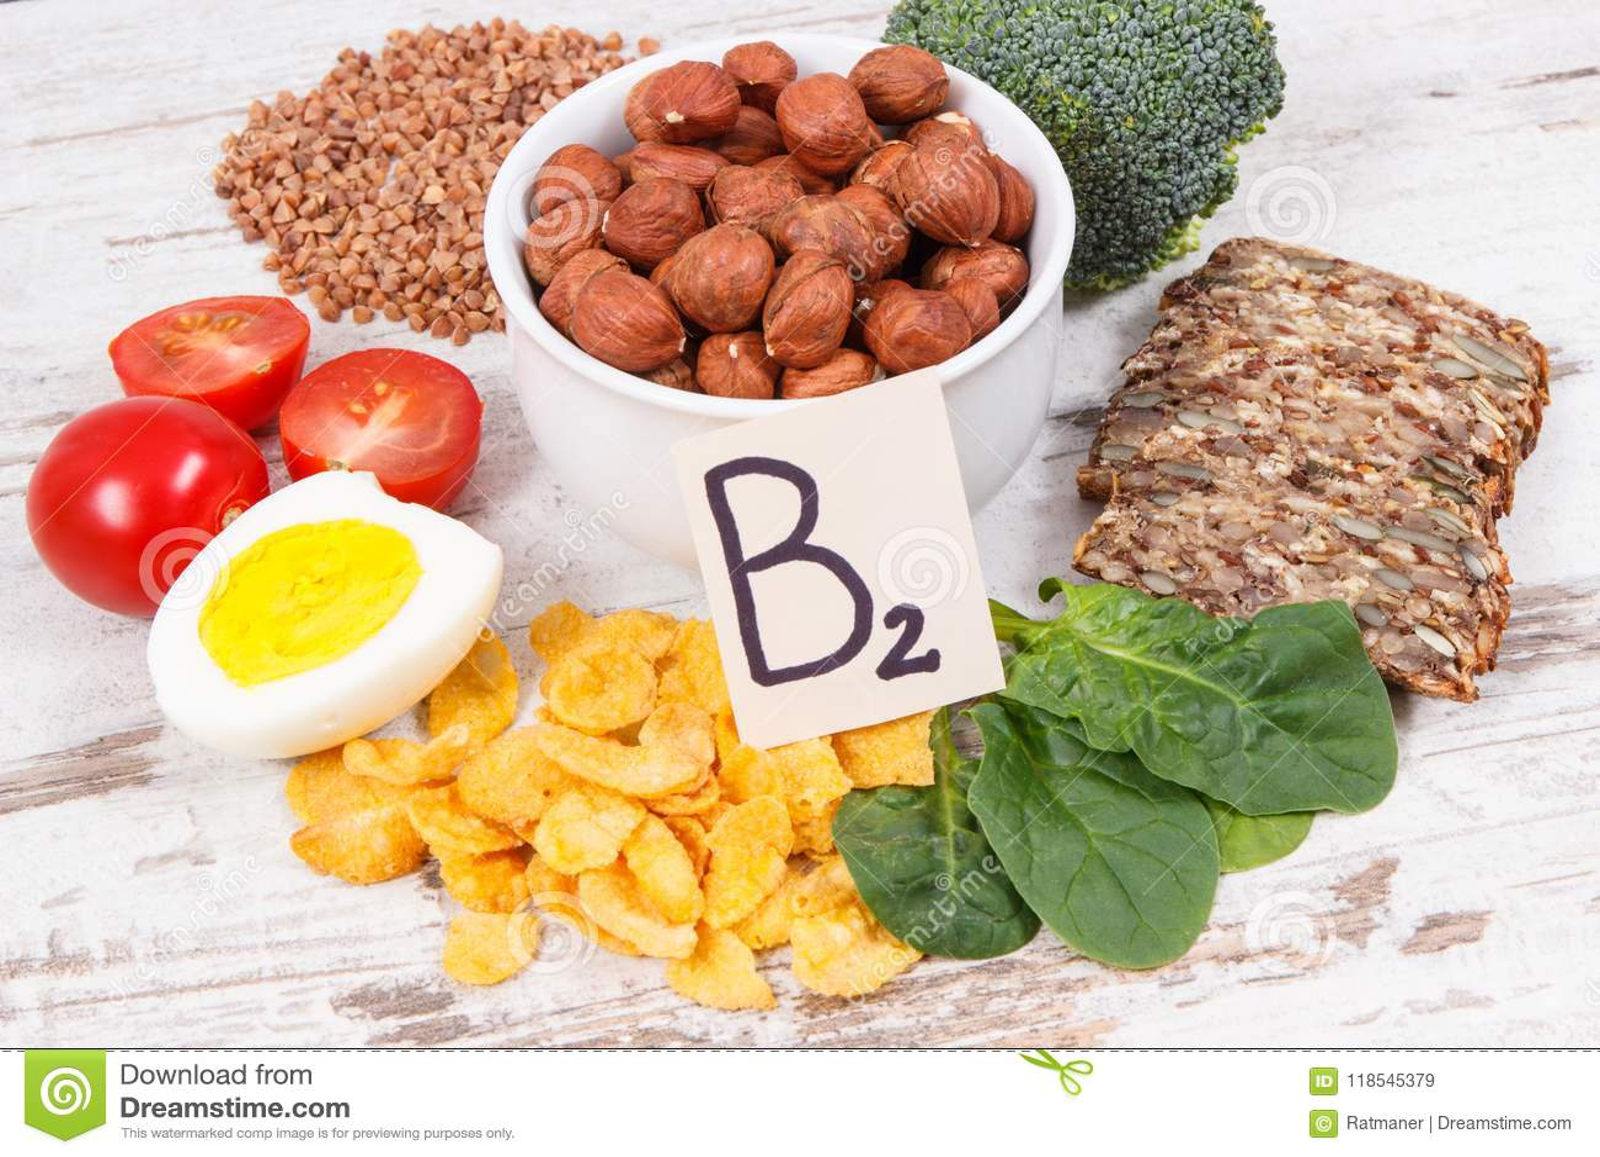 que contiene vitamina b